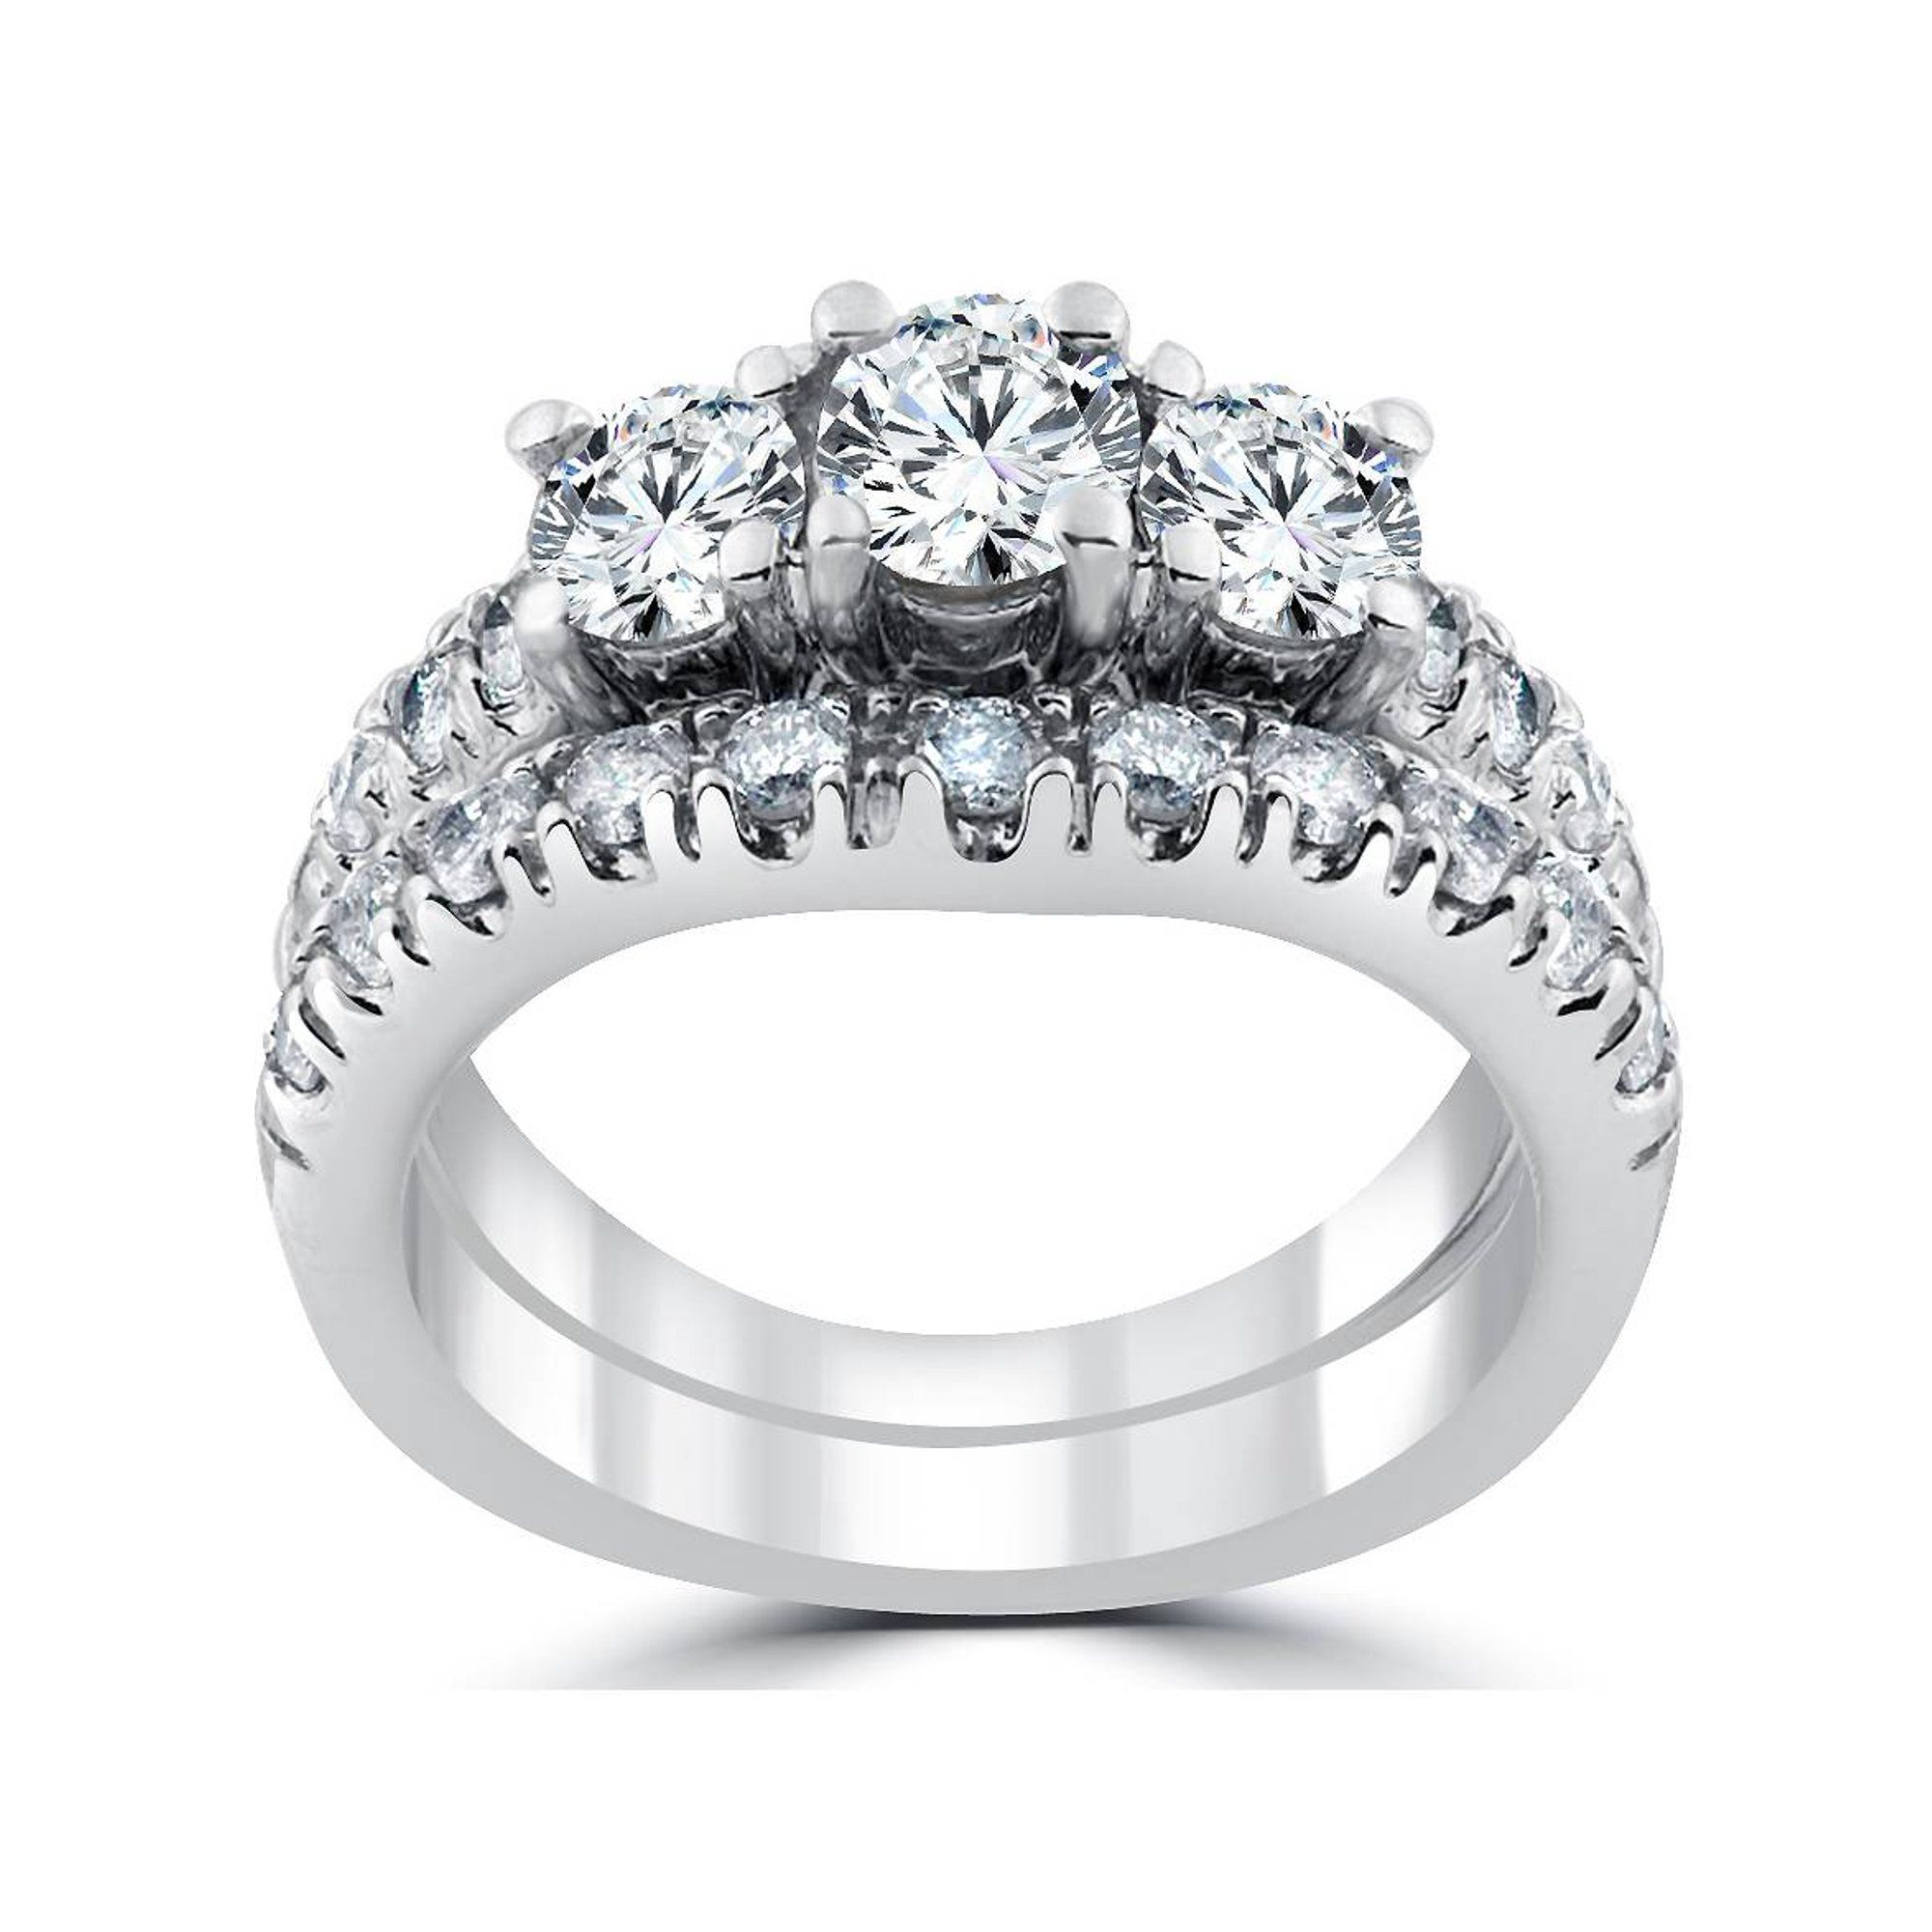 Pompeii3 1 1 2 Ct 3 Stone Diamond Engagement Ring Matching Wedding Band Set White Gold Walmart Com Engagement Ring Matching Wedding Band Matching Wedding Band Sets Wedding Band Sets